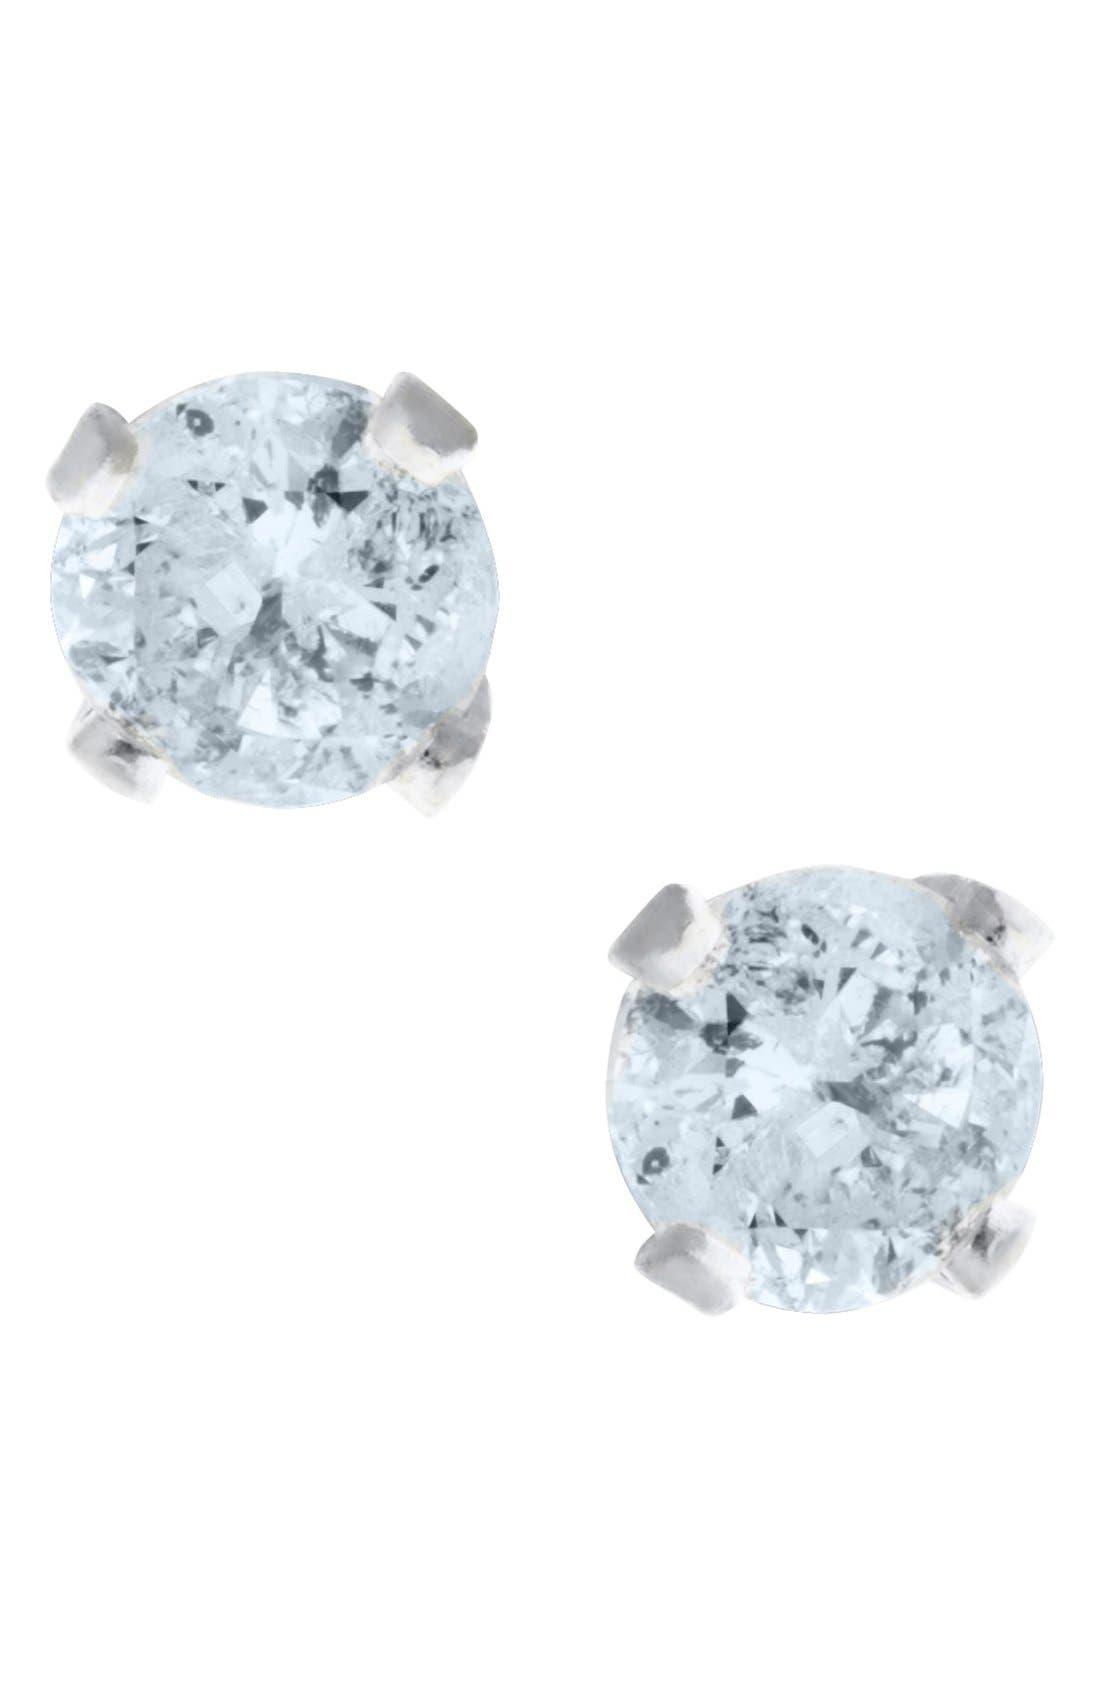 14k White Gold & Diamond Stud Earrings,                             Main thumbnail 1, color,                             SILVER